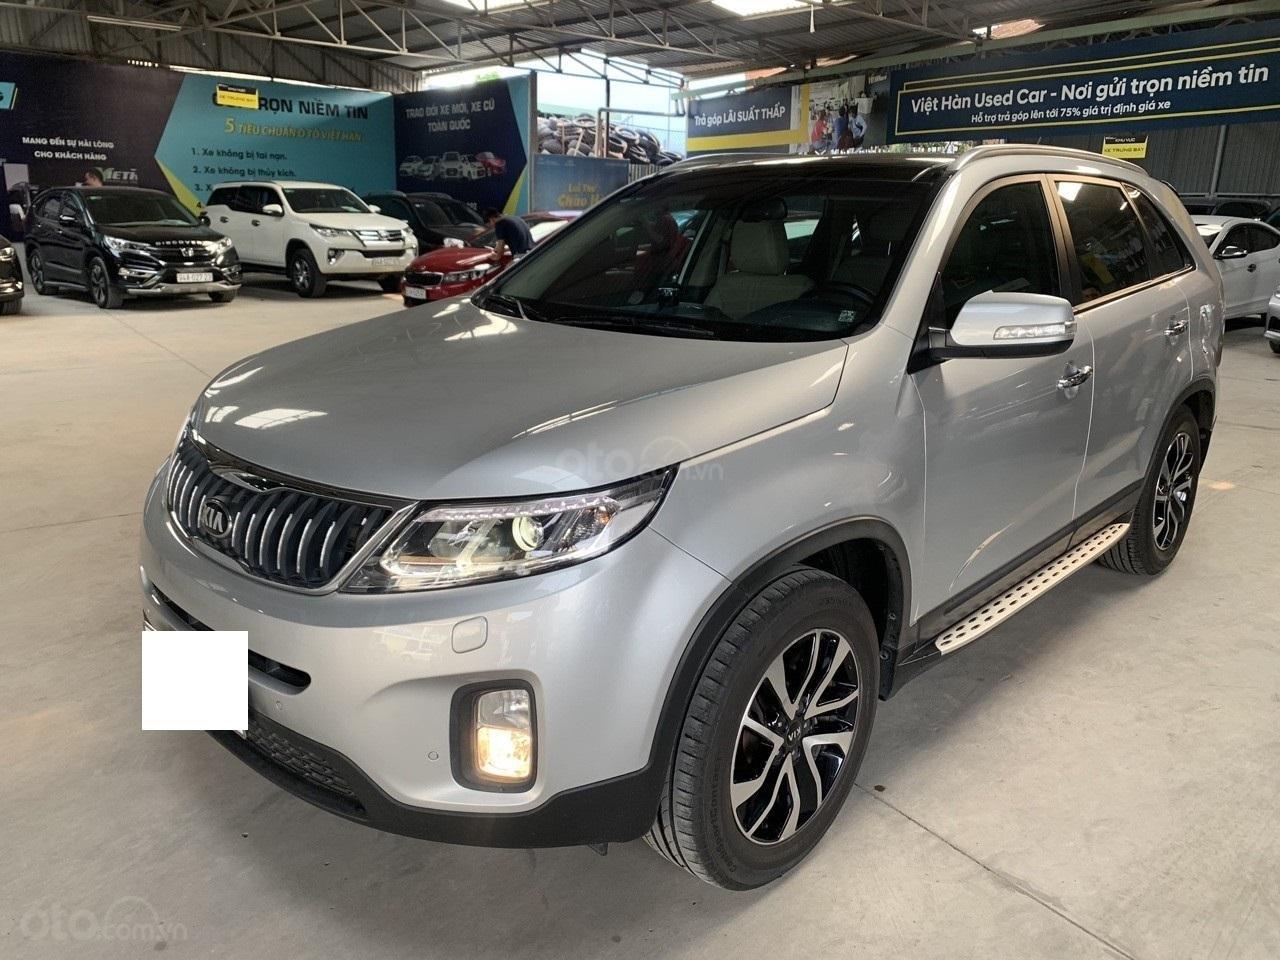 Kia Sorento DATH 2.2AT, Full dầu, 2018 Form mới (2)